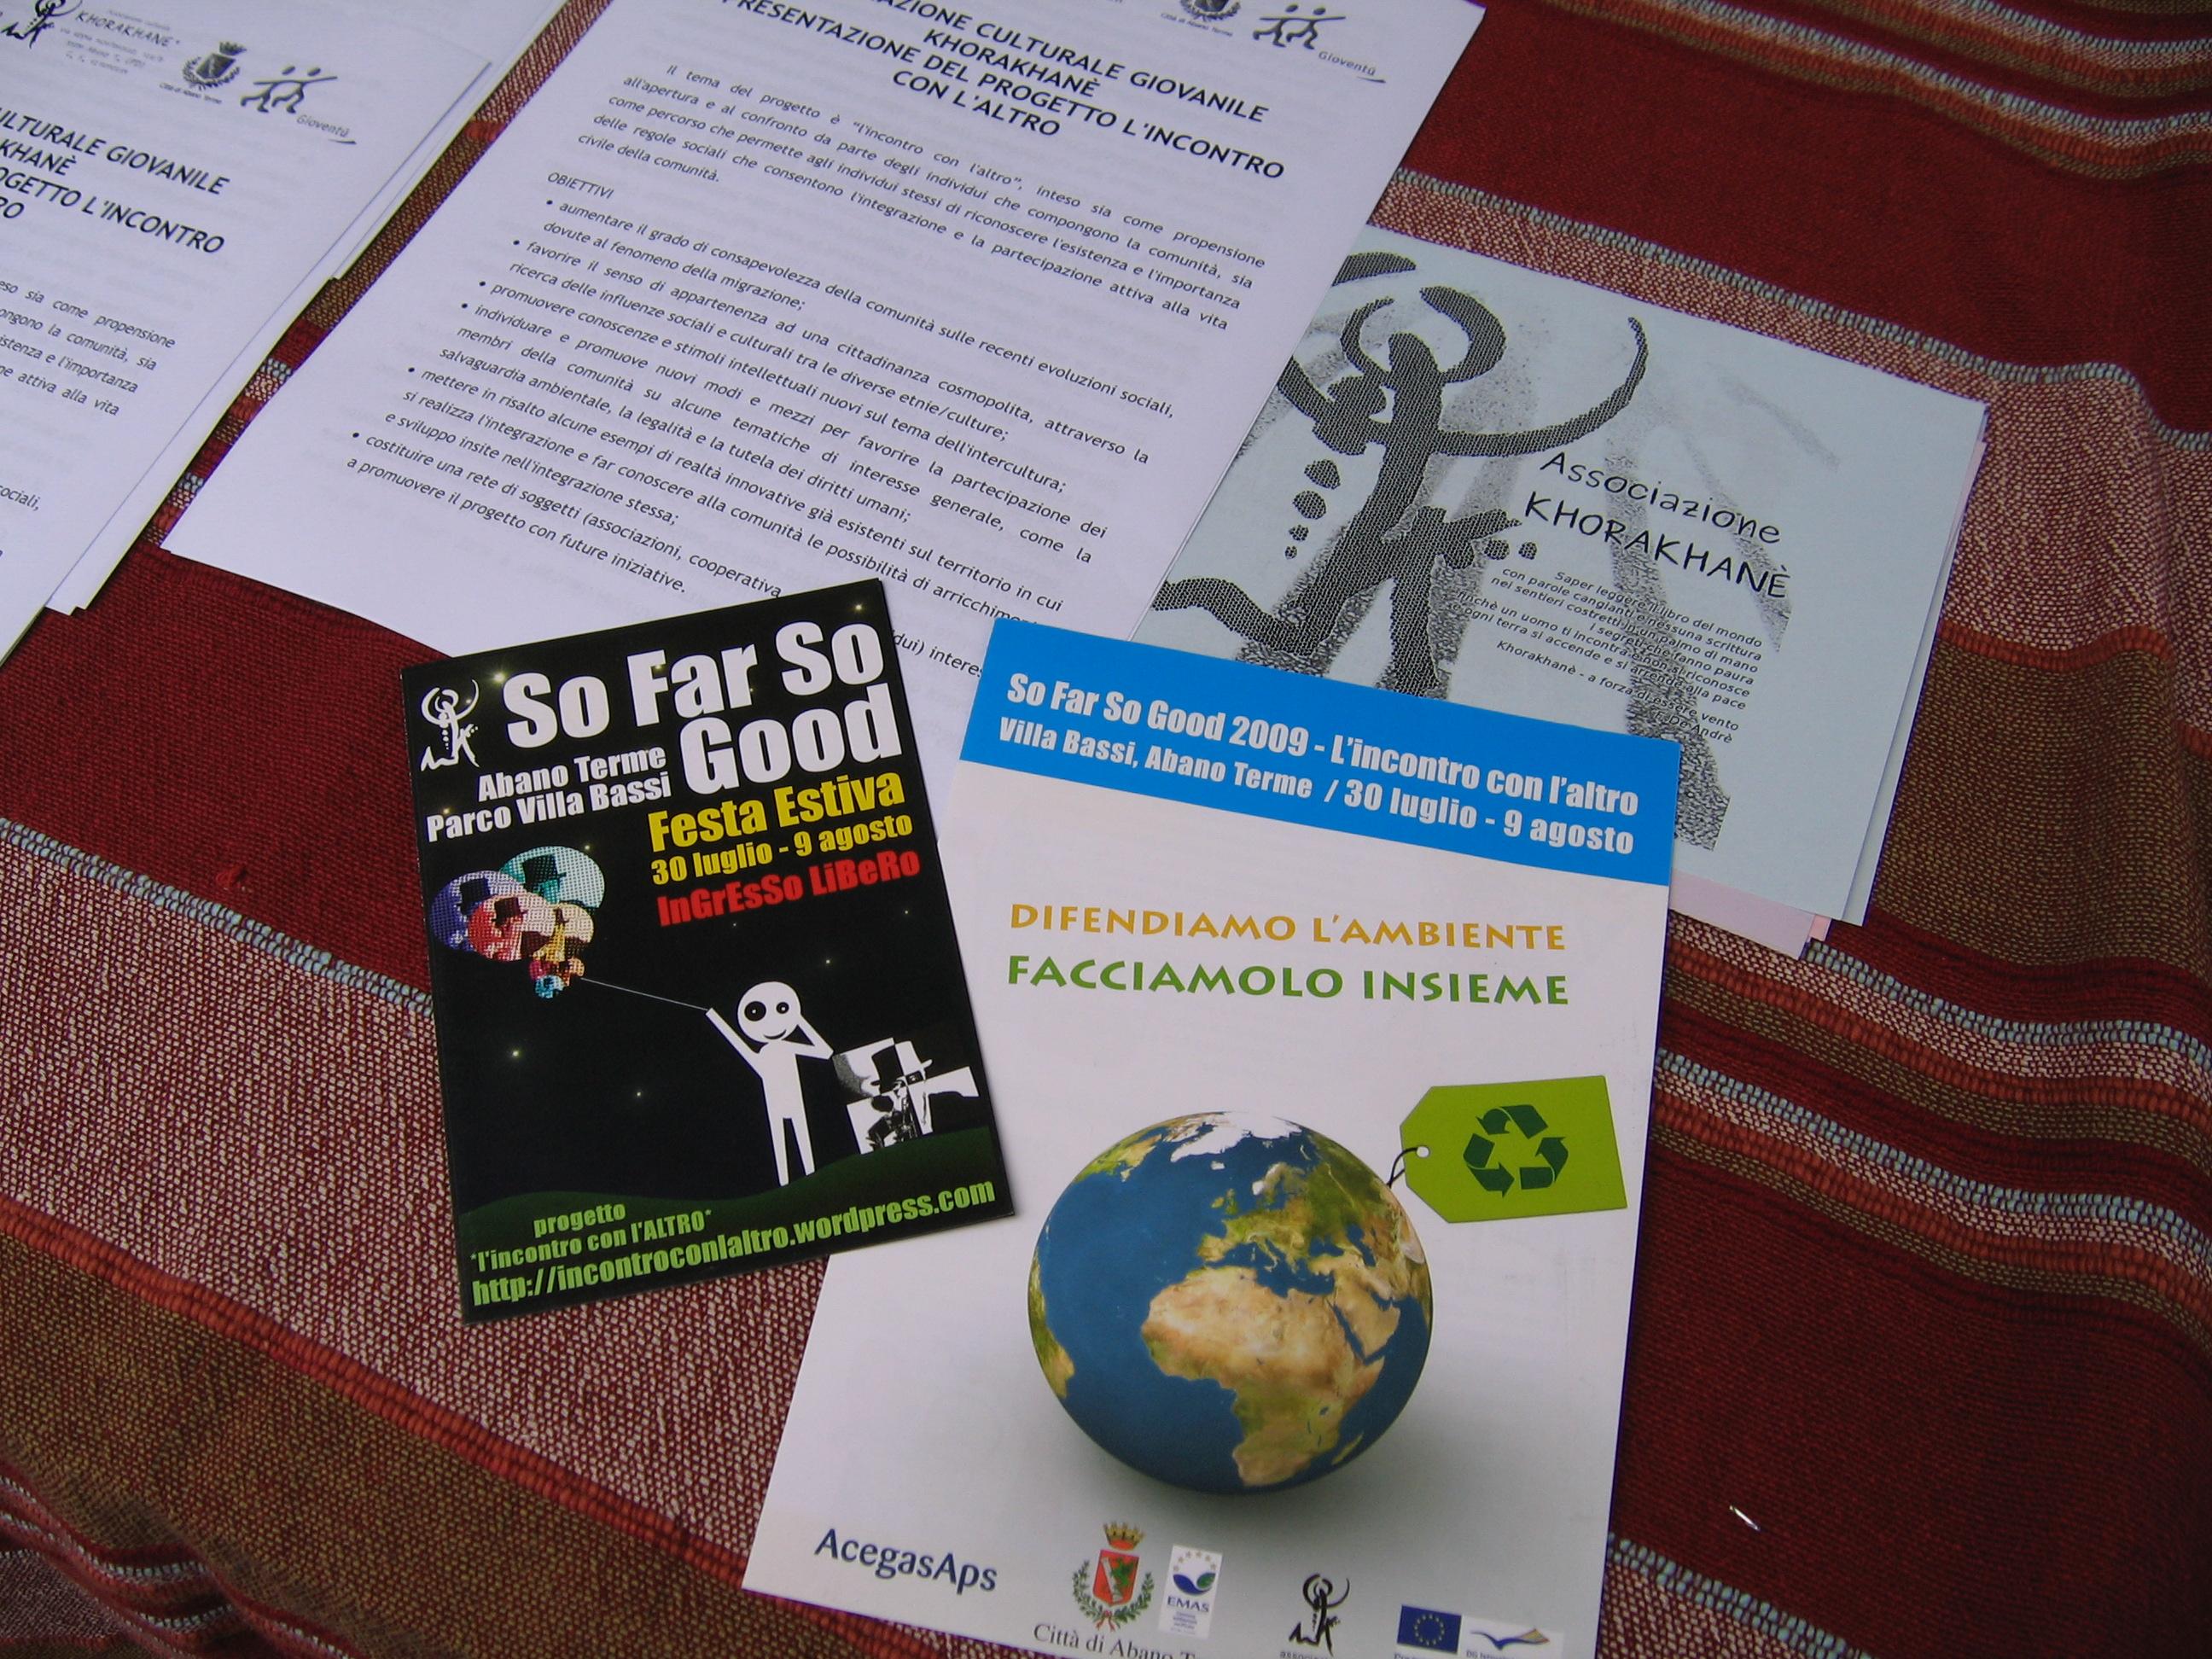 Khorakhane e Aps insieme per l'ambiente